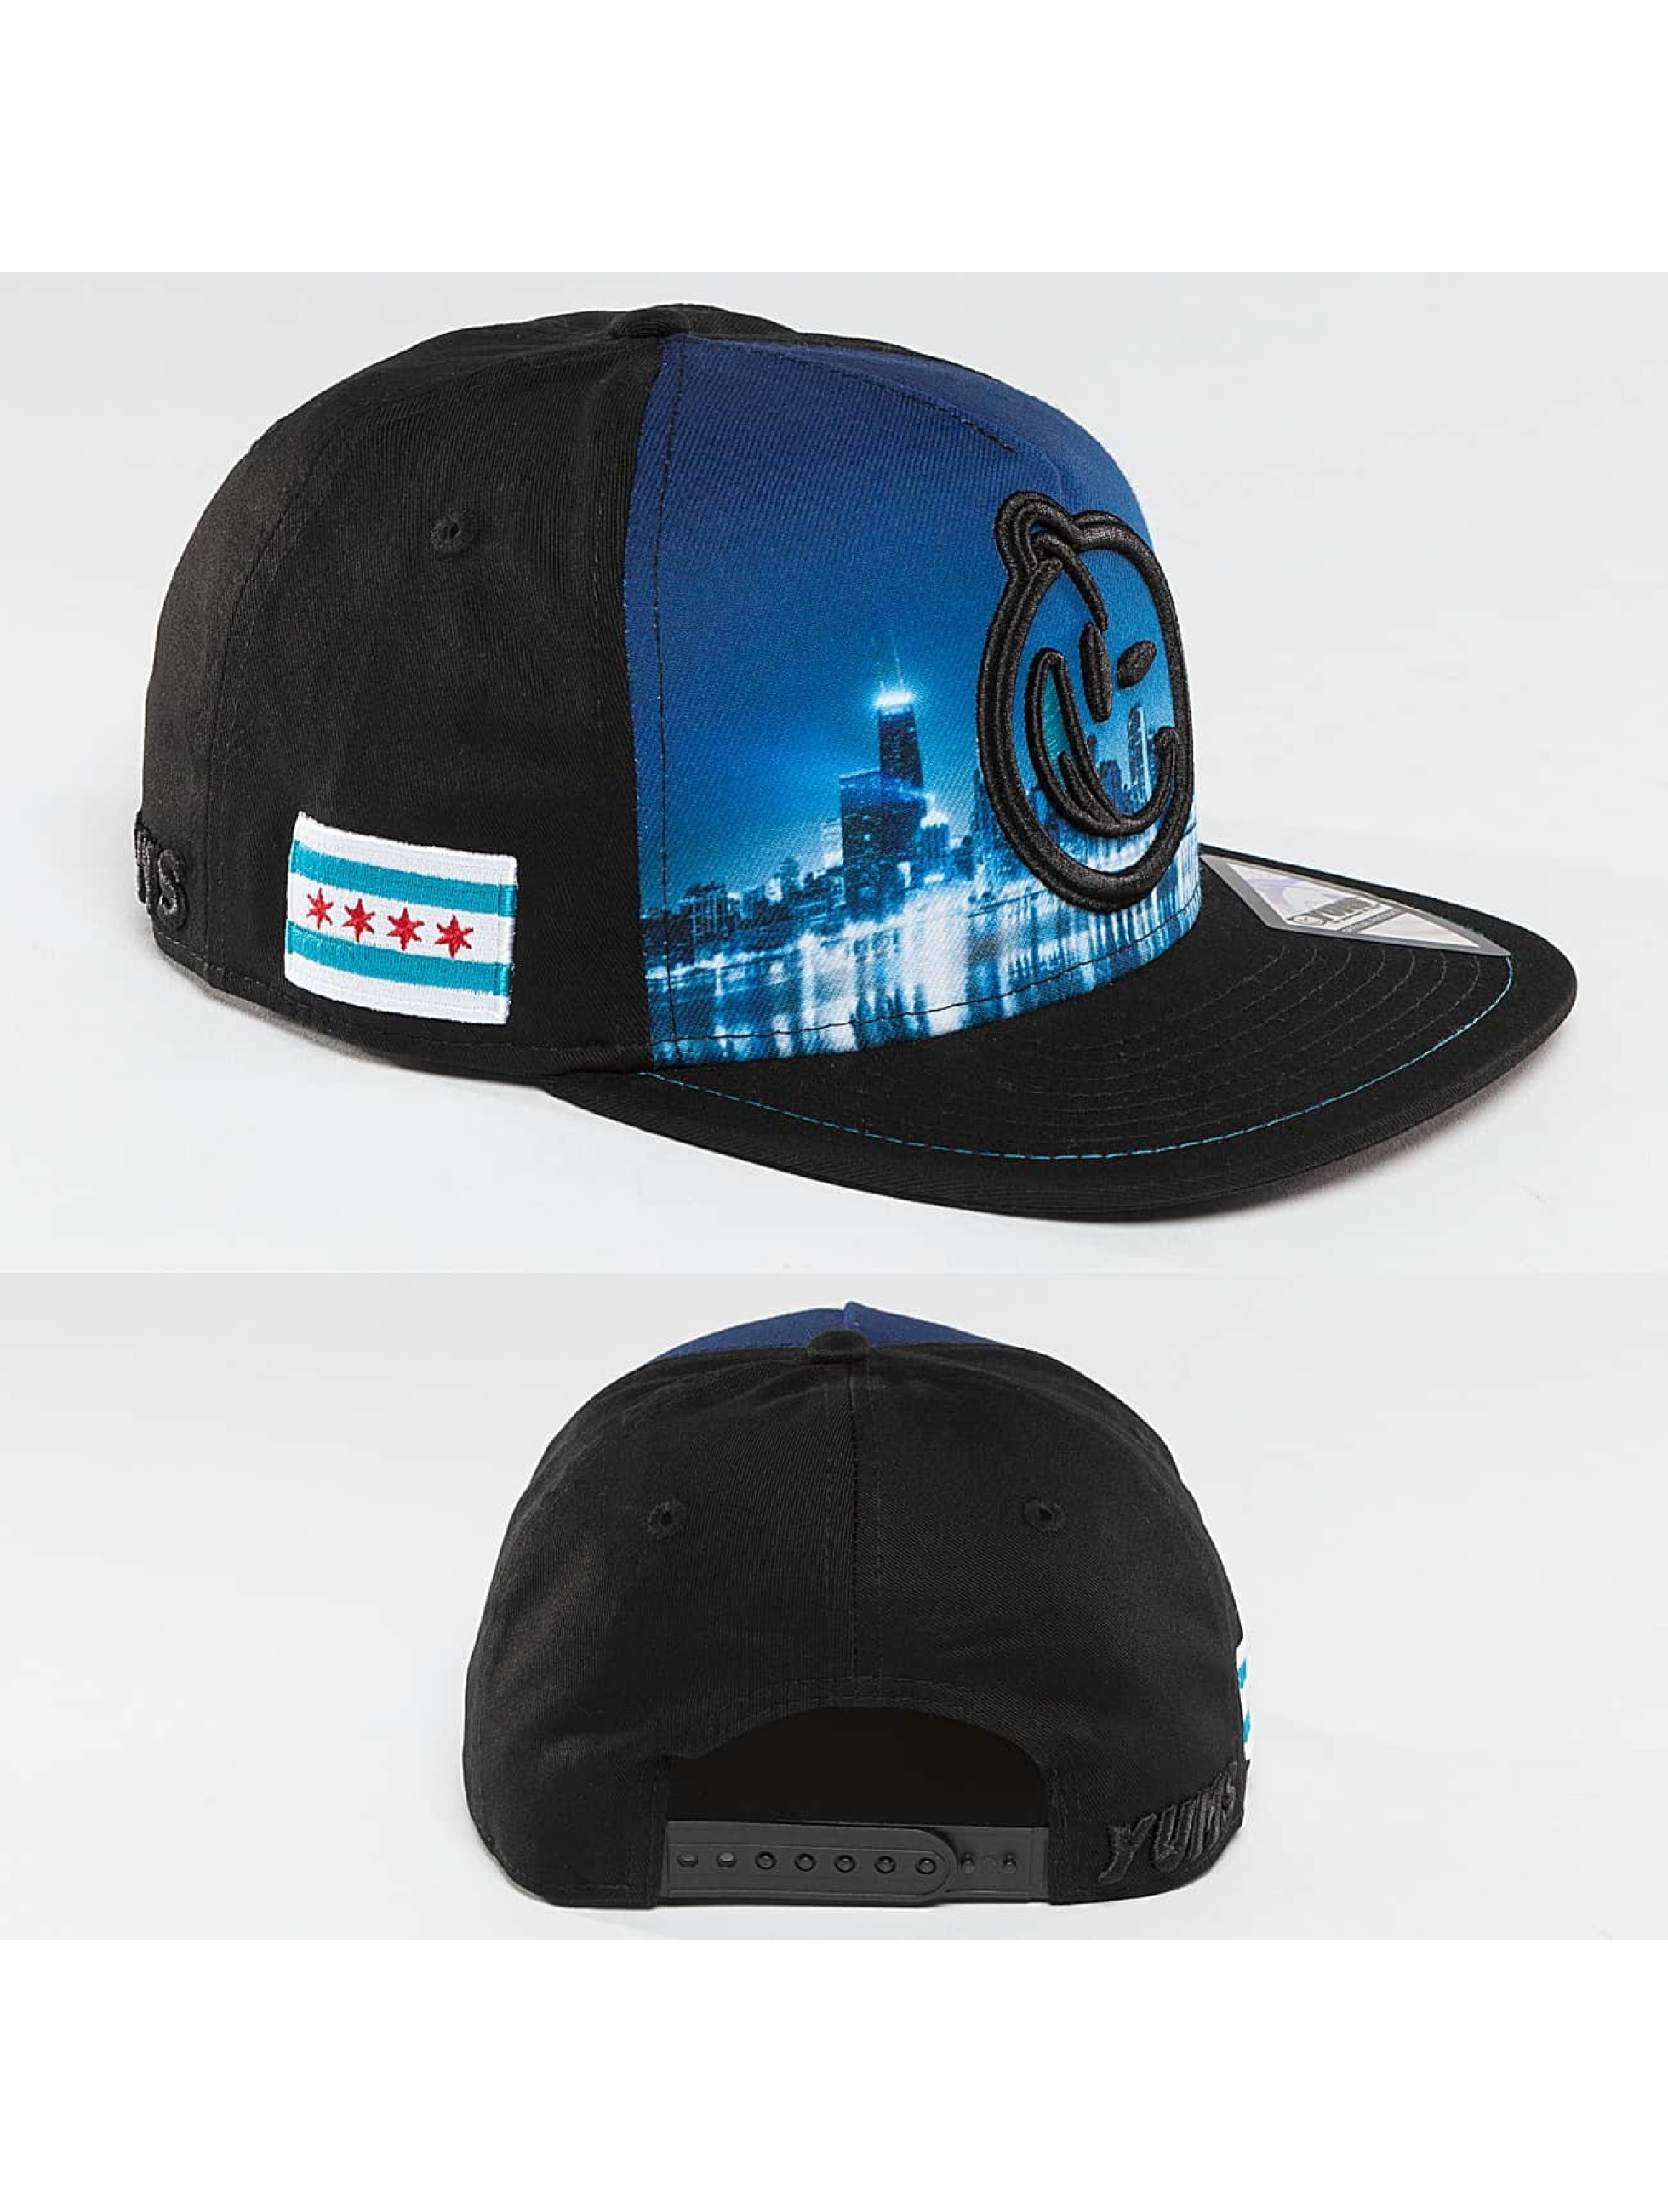 Yums Chicago 2.0 Snapback Cap Black/Blue/White Sale Angebote Döbern